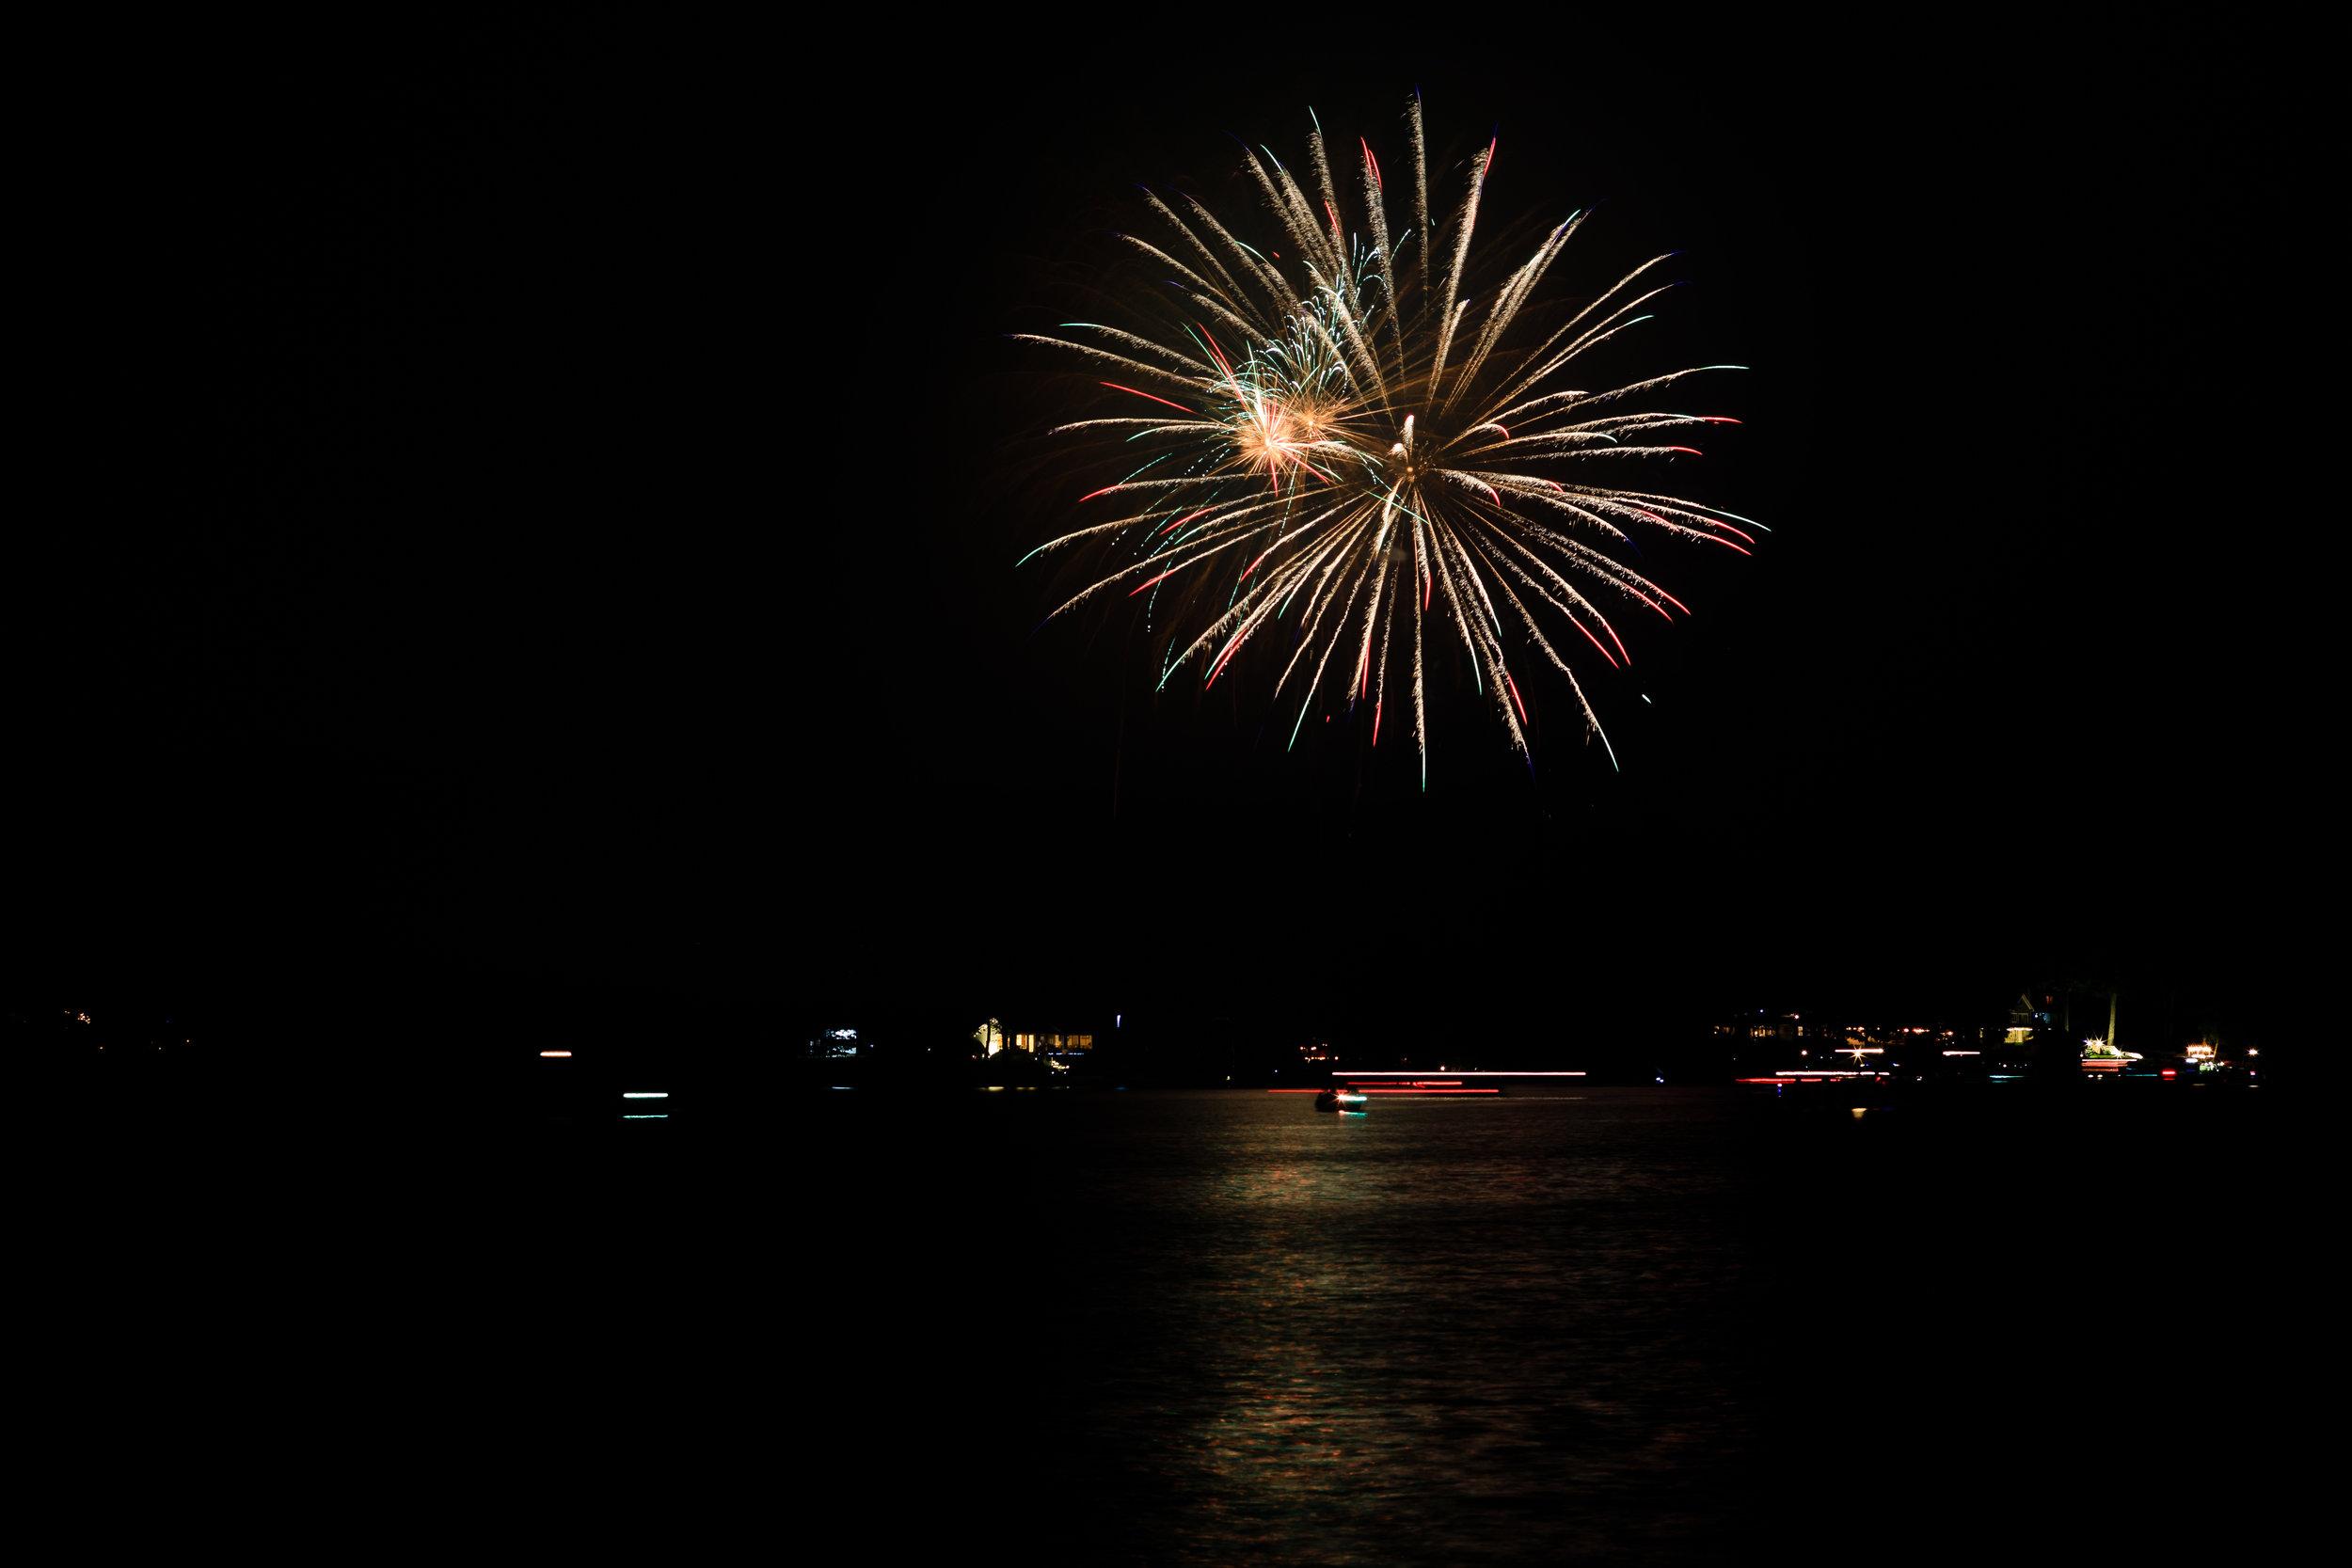 Fireworks-2580.jpg